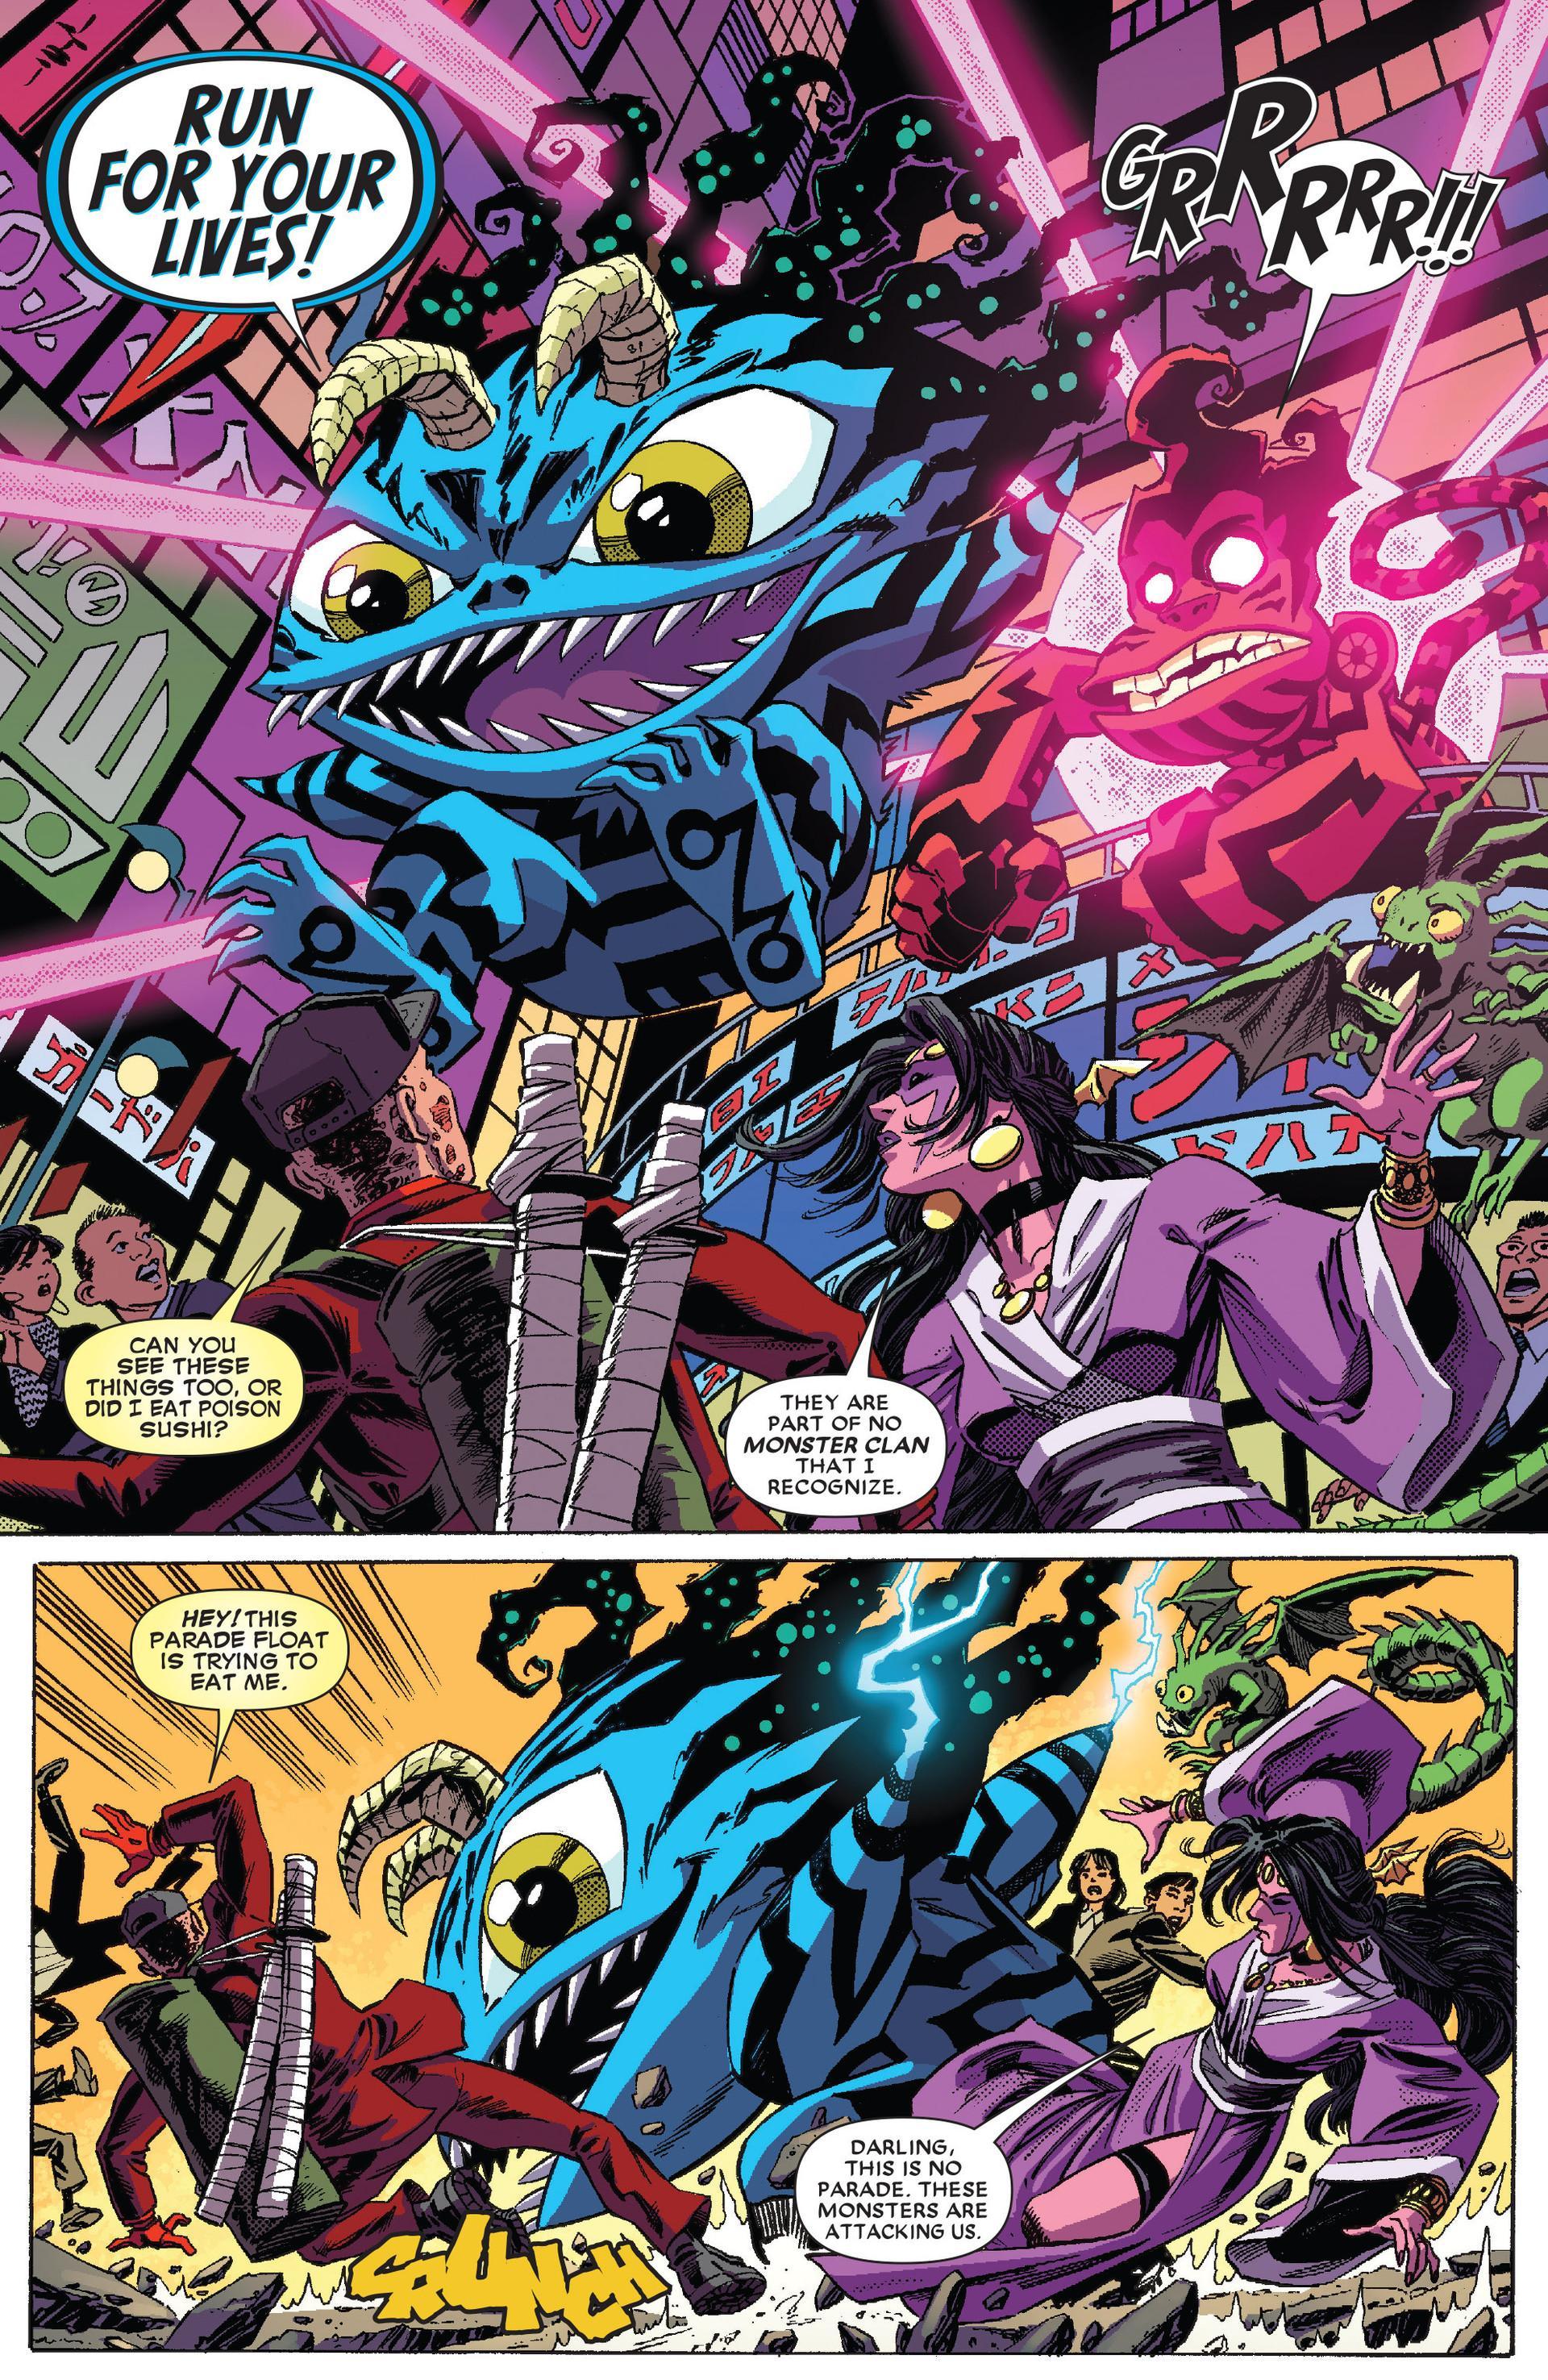 Deadpool by Posehn & Duggan Vol 3 Review